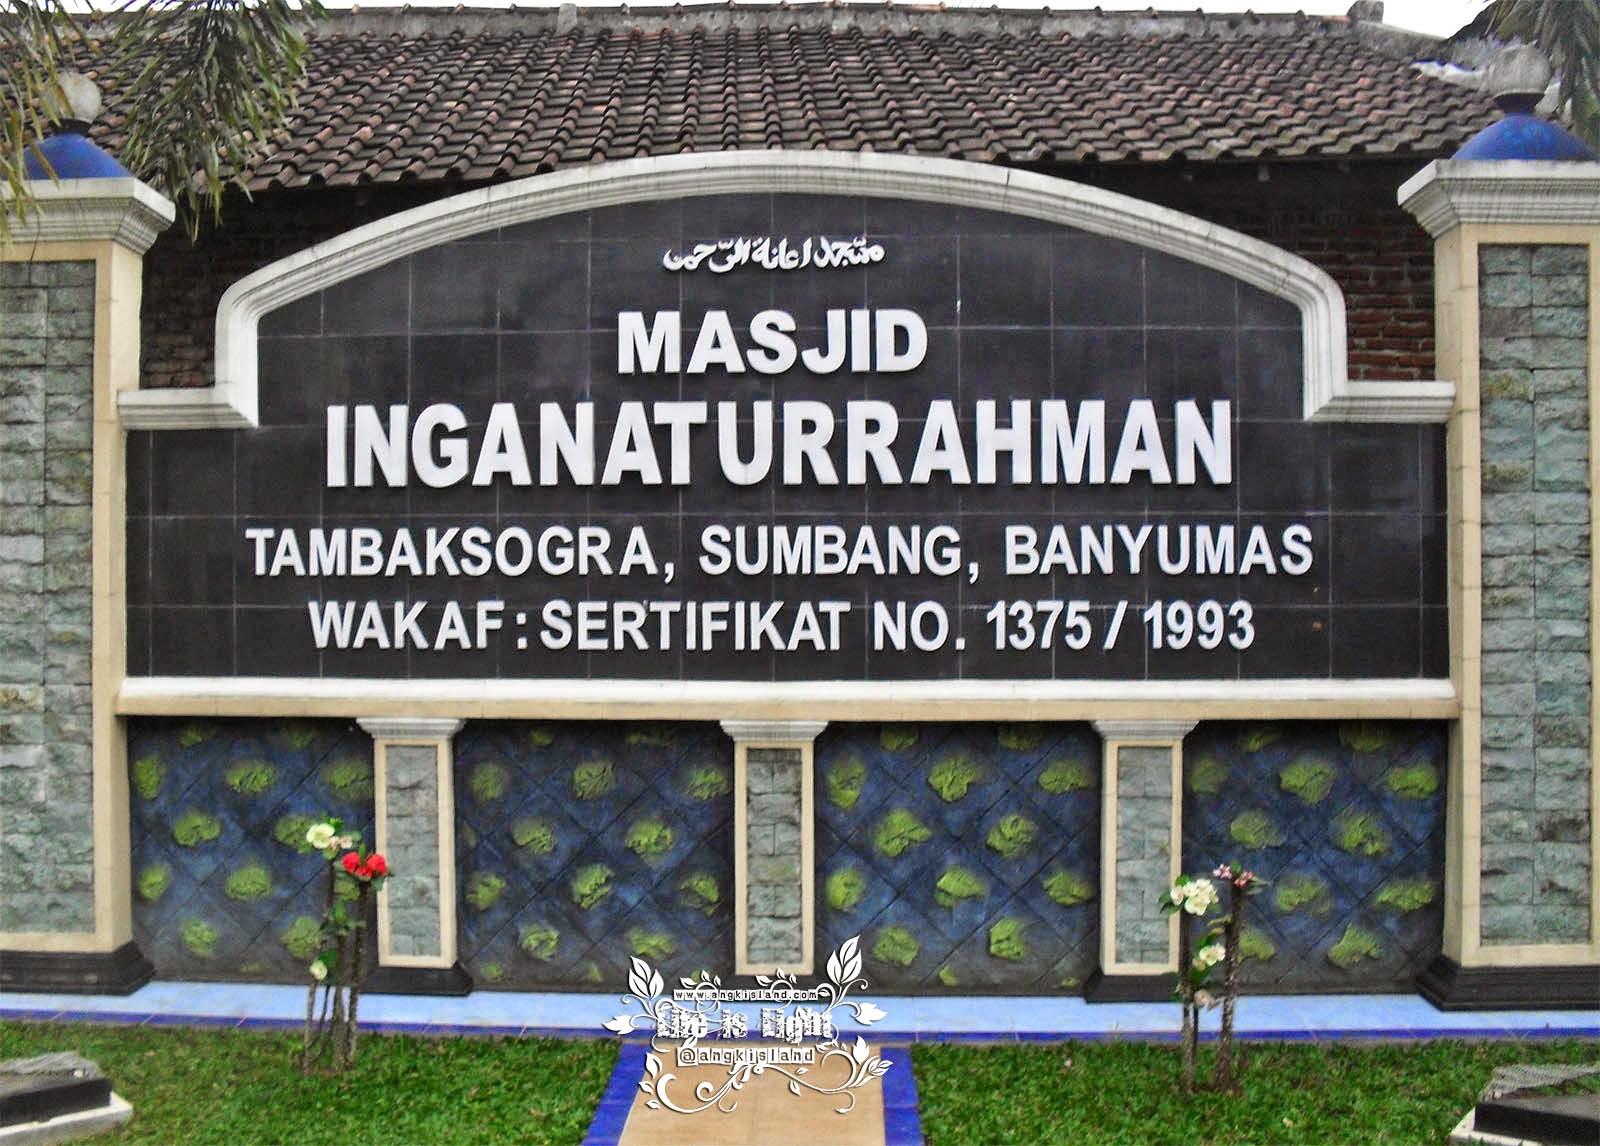 masjid inganaturahman